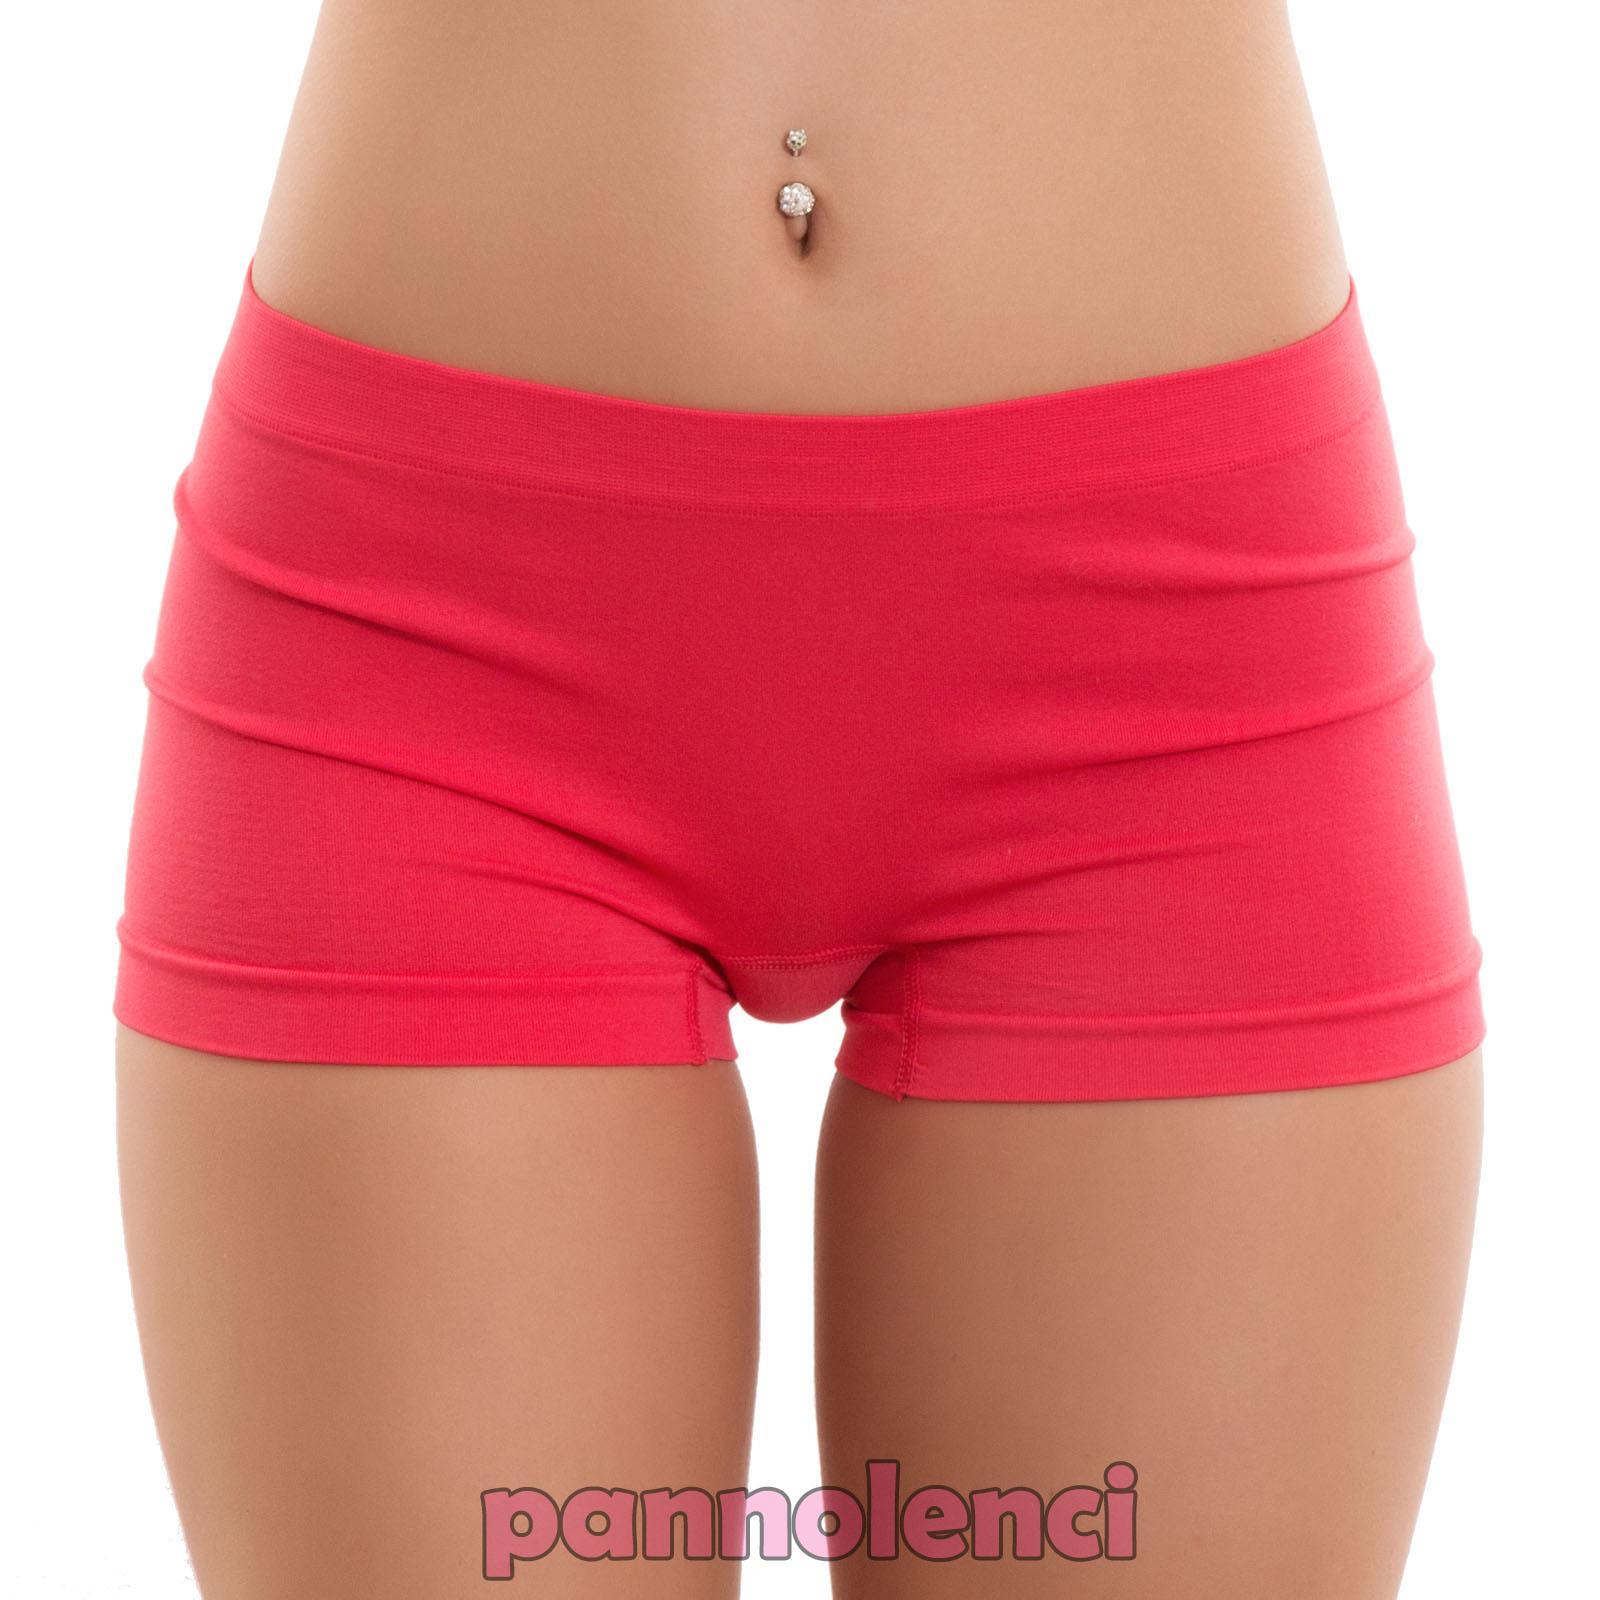 Pantaloncini donna culotte shorts intimo fitness sport hot pant nuovi YQ3308